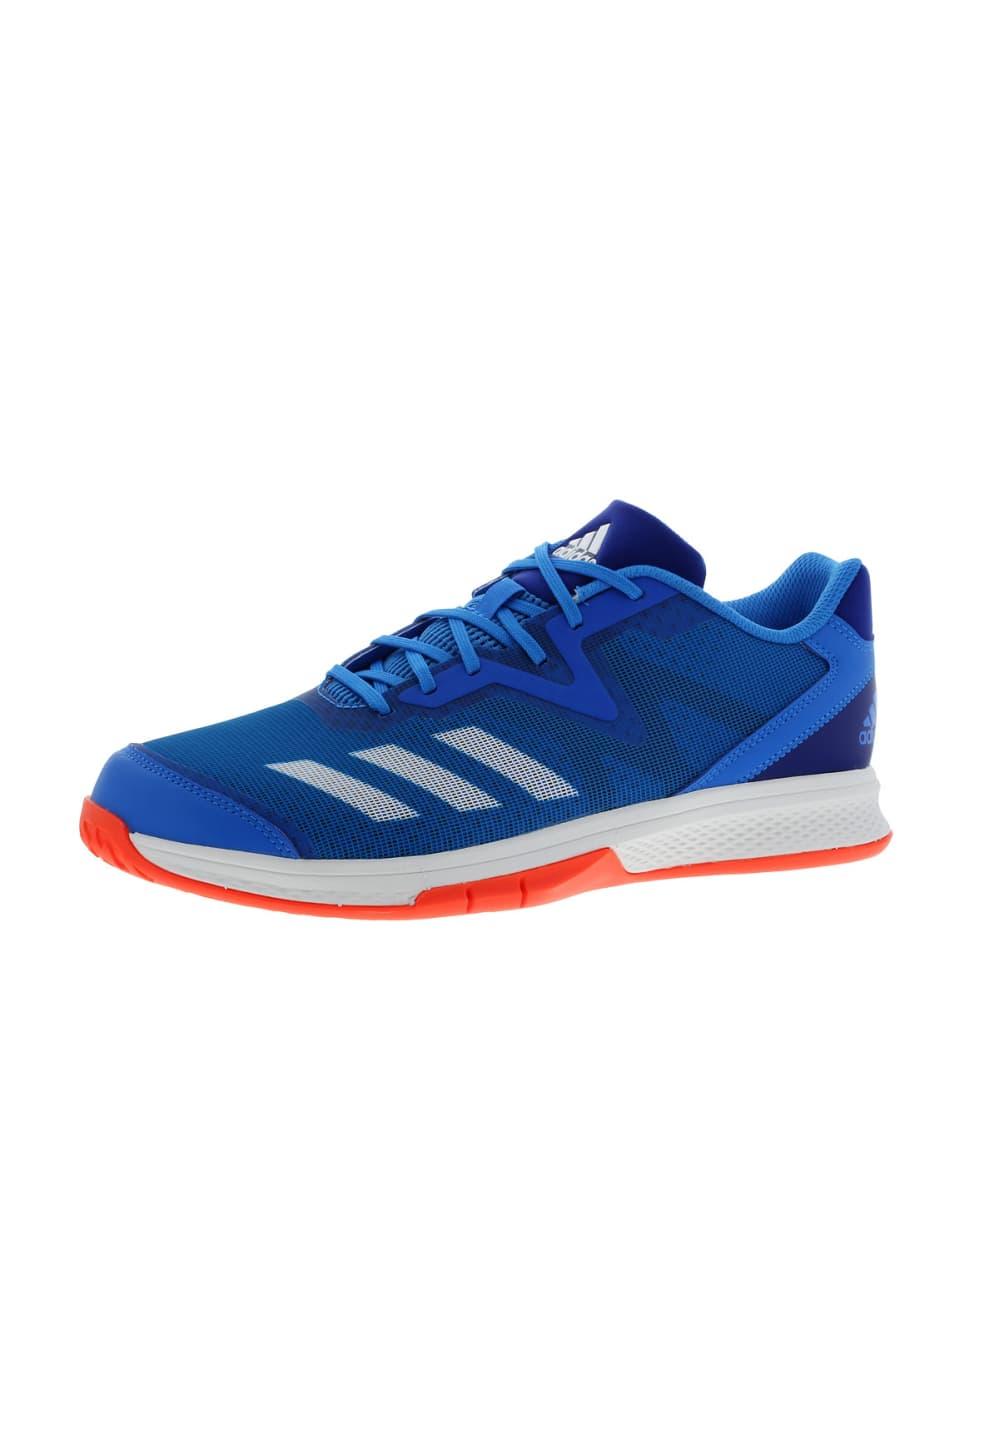 Counterblast Pour Exadic Homme Adidas Bleu Handball Chaussures bvf67gYy